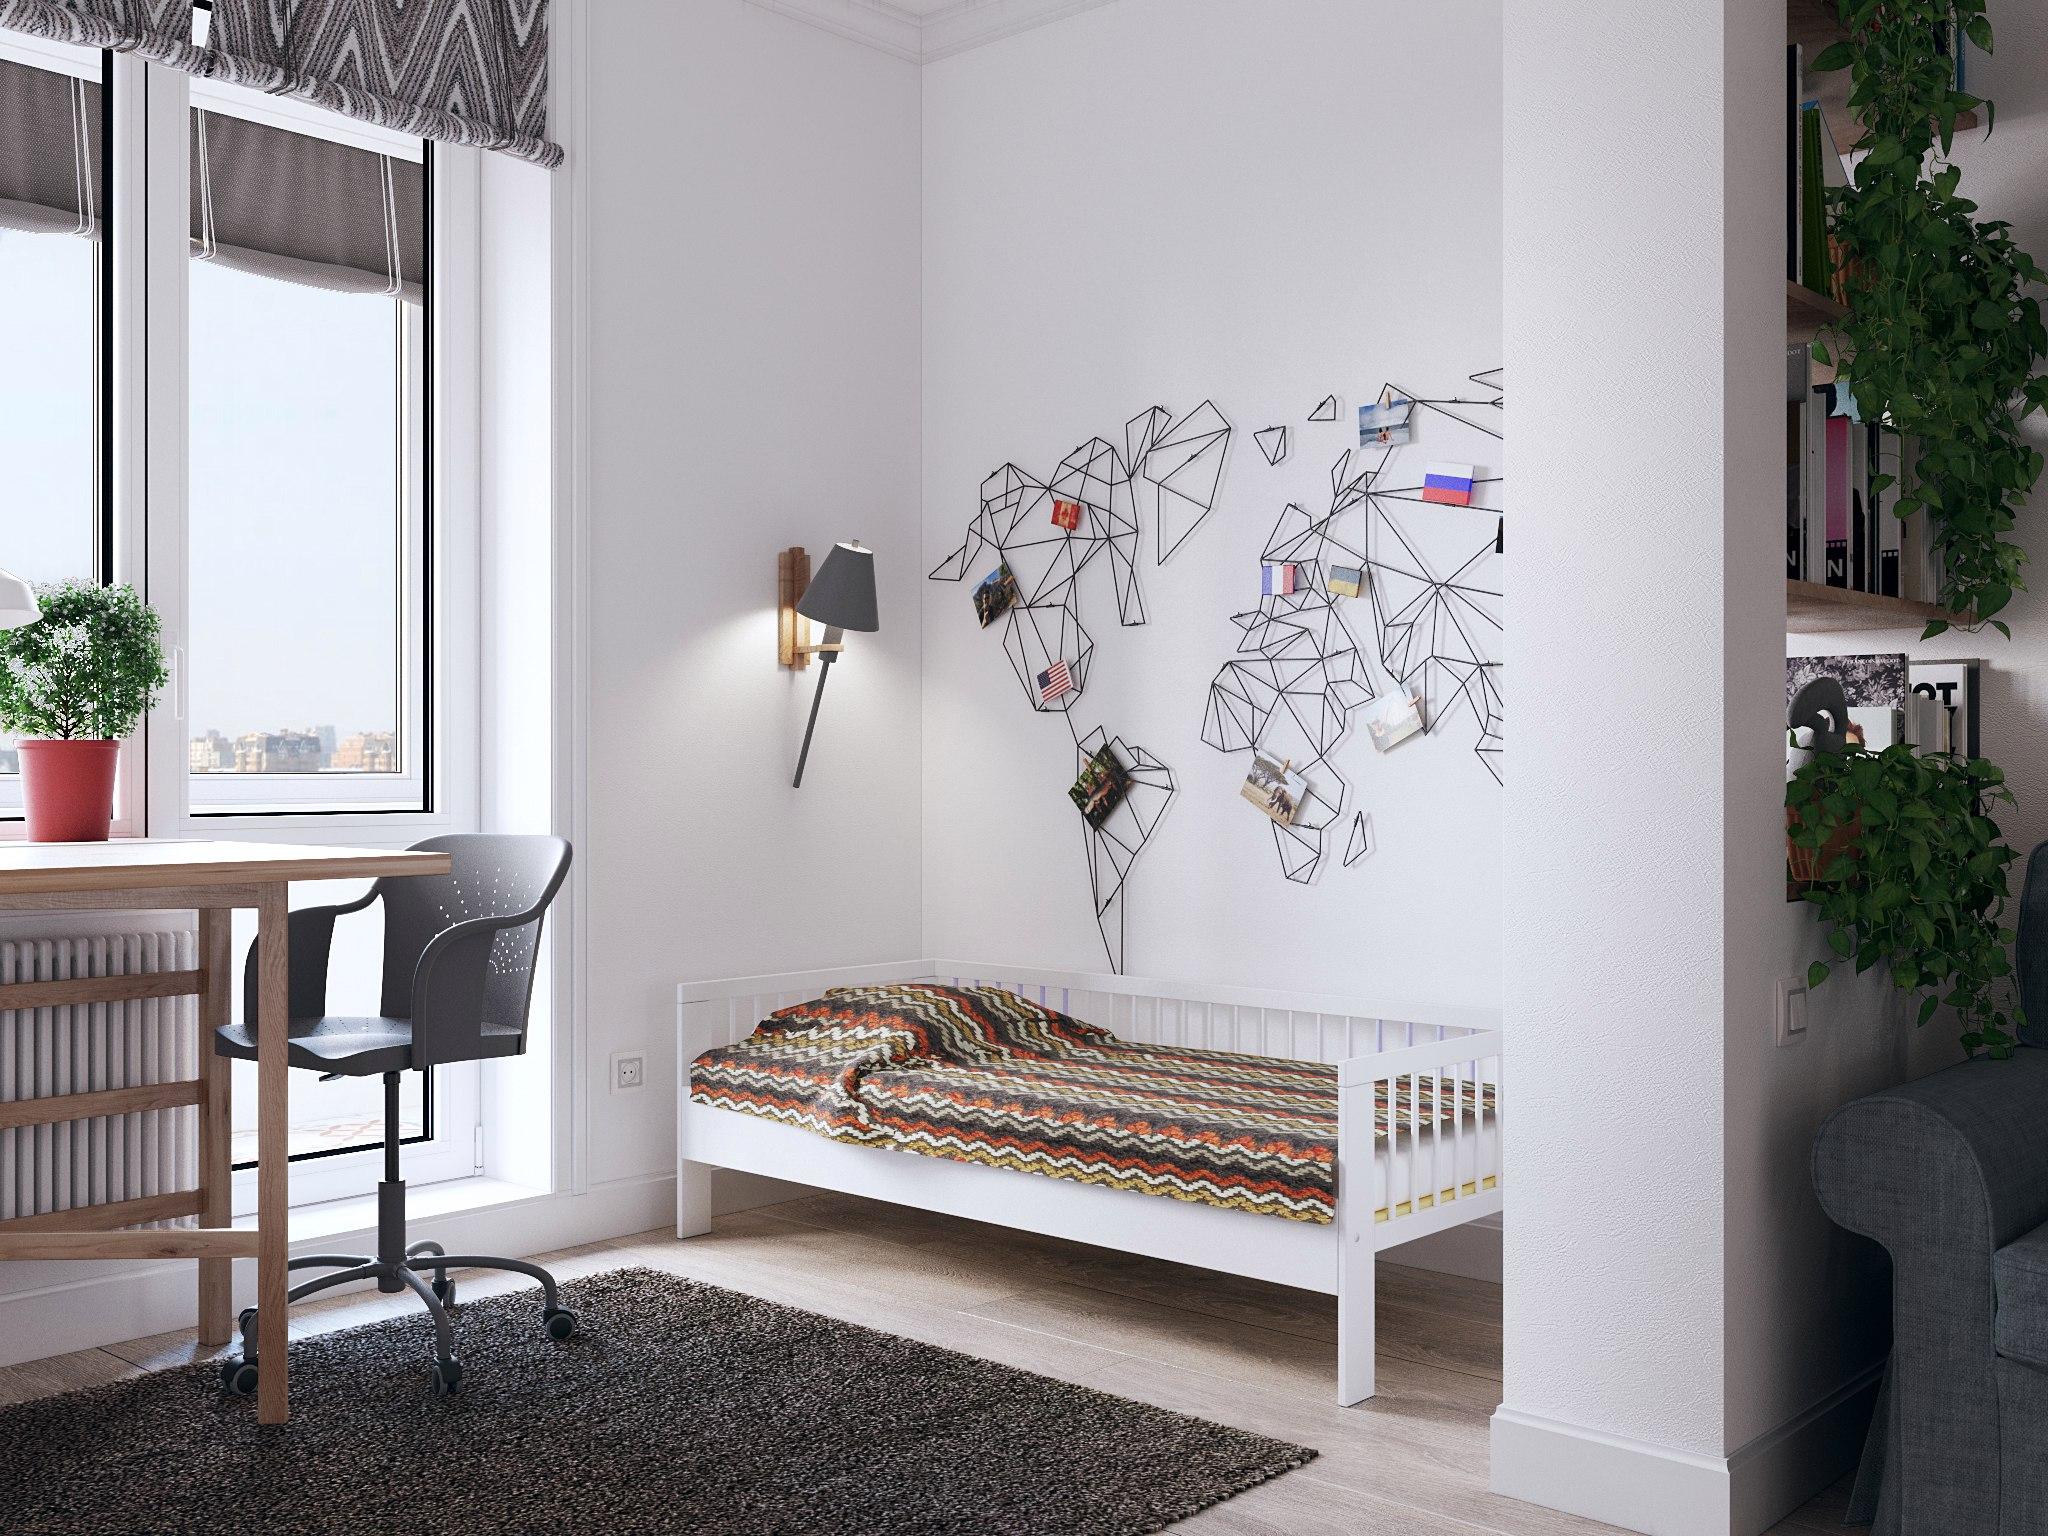 Дизайн проект квартиры студии 28 кв м.